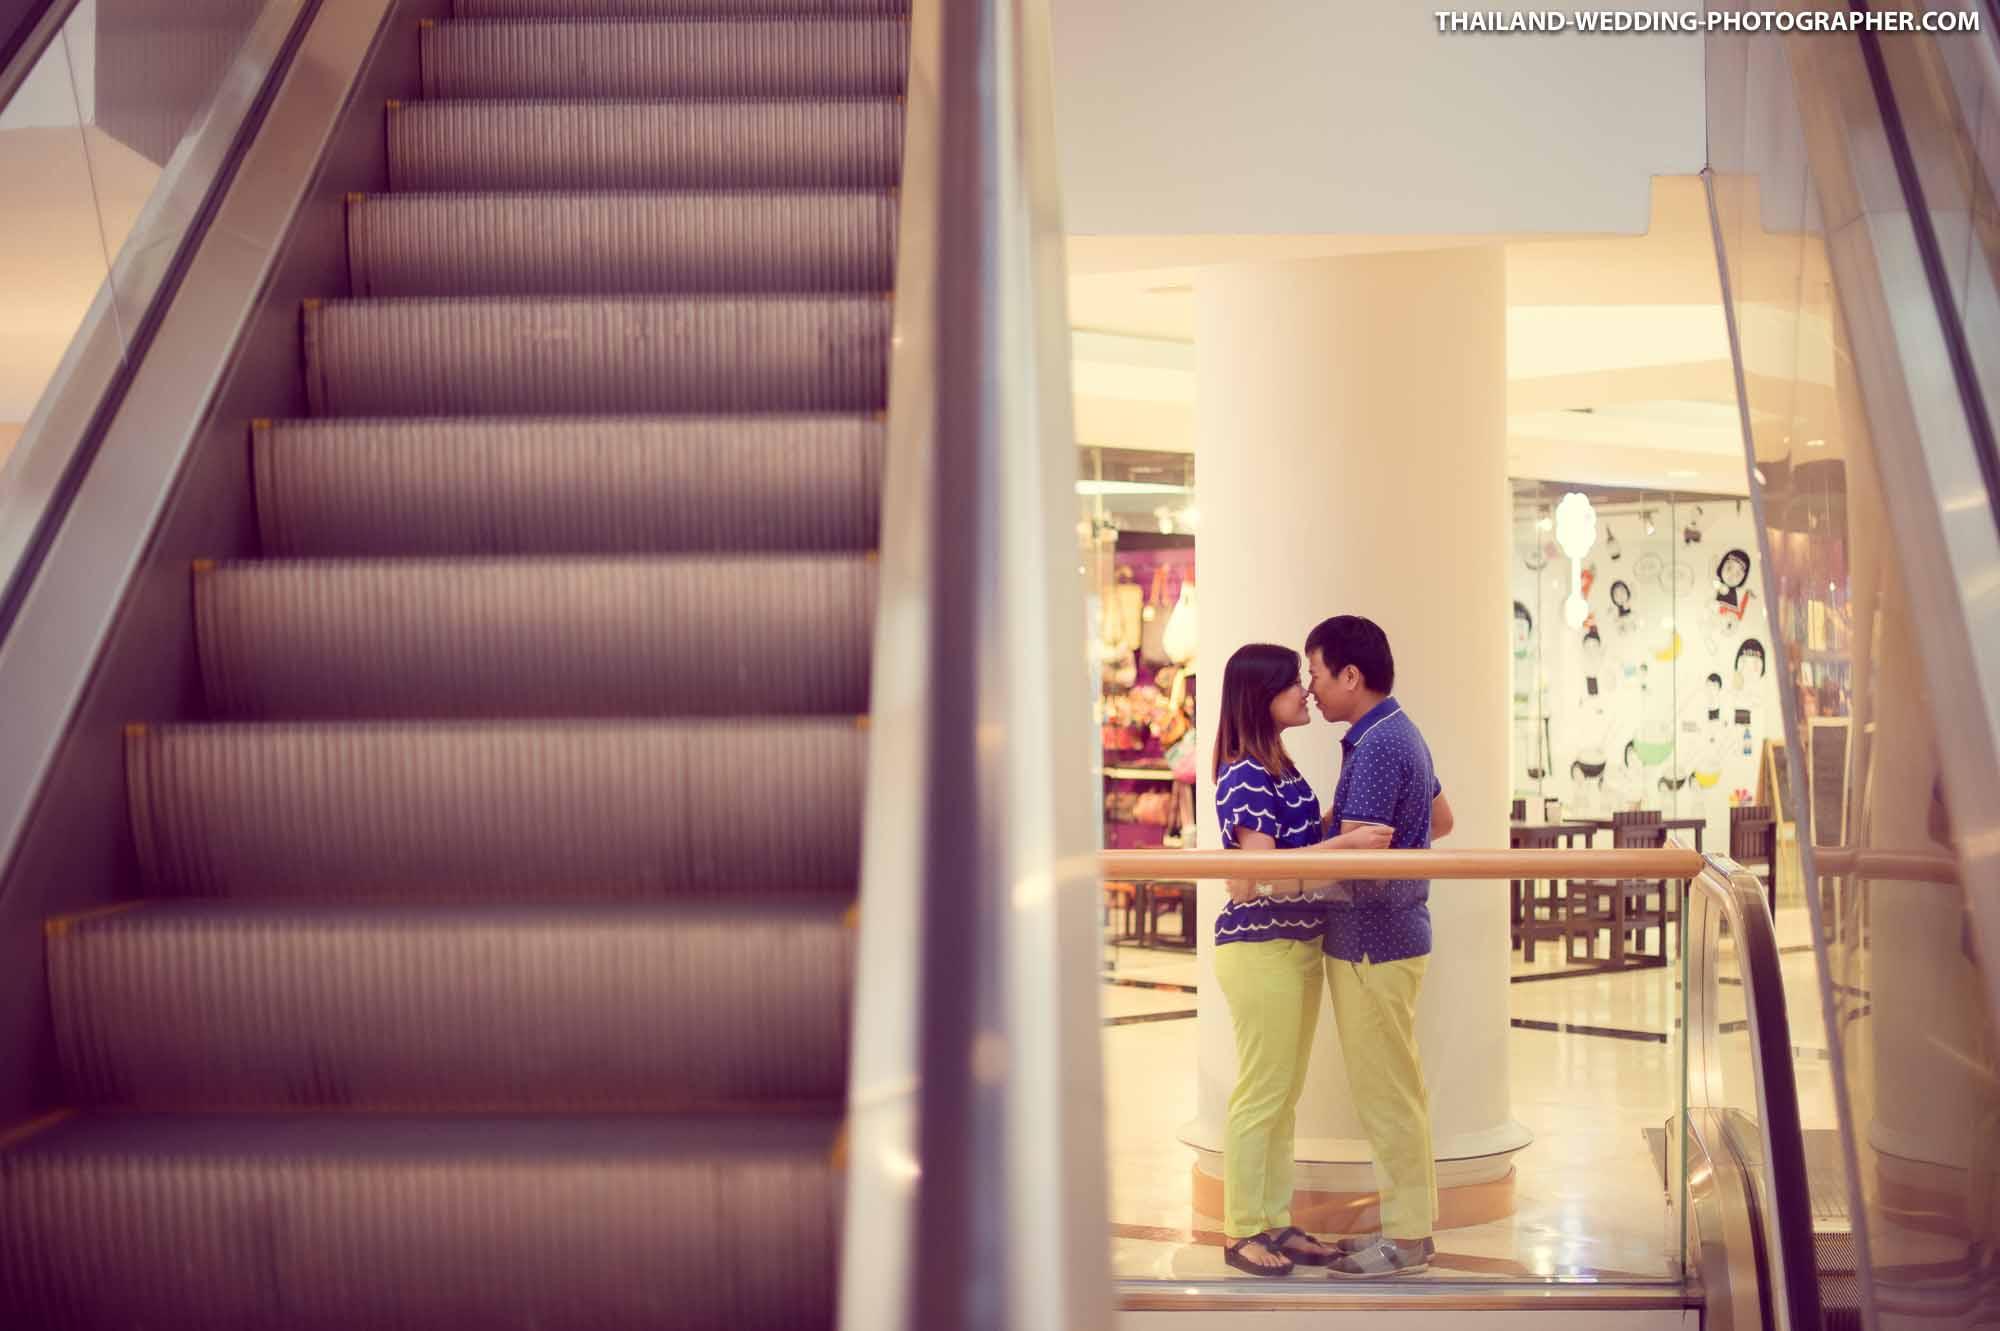 Thailand Bangkok Siam Wedding Photography | NET-Photography Thailand Wedding Photographer